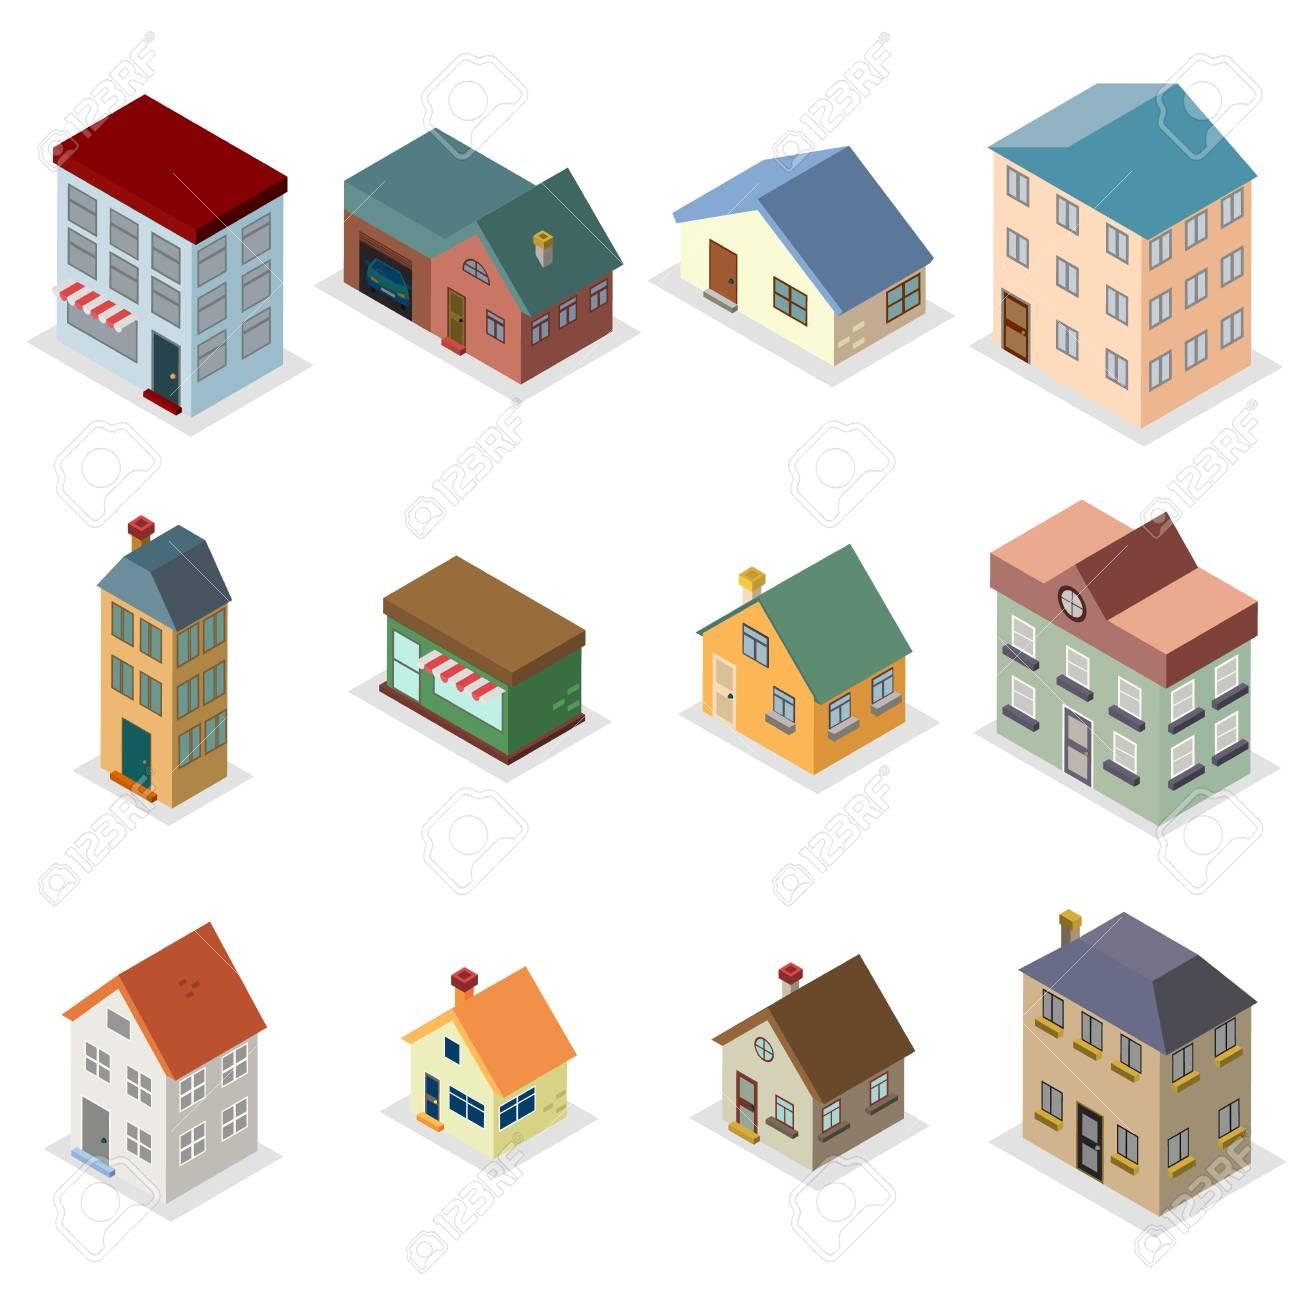 Moderne Trendige Retro Haus Straße Isometrische Design Konzept  Vektor Illustration Standard Bild